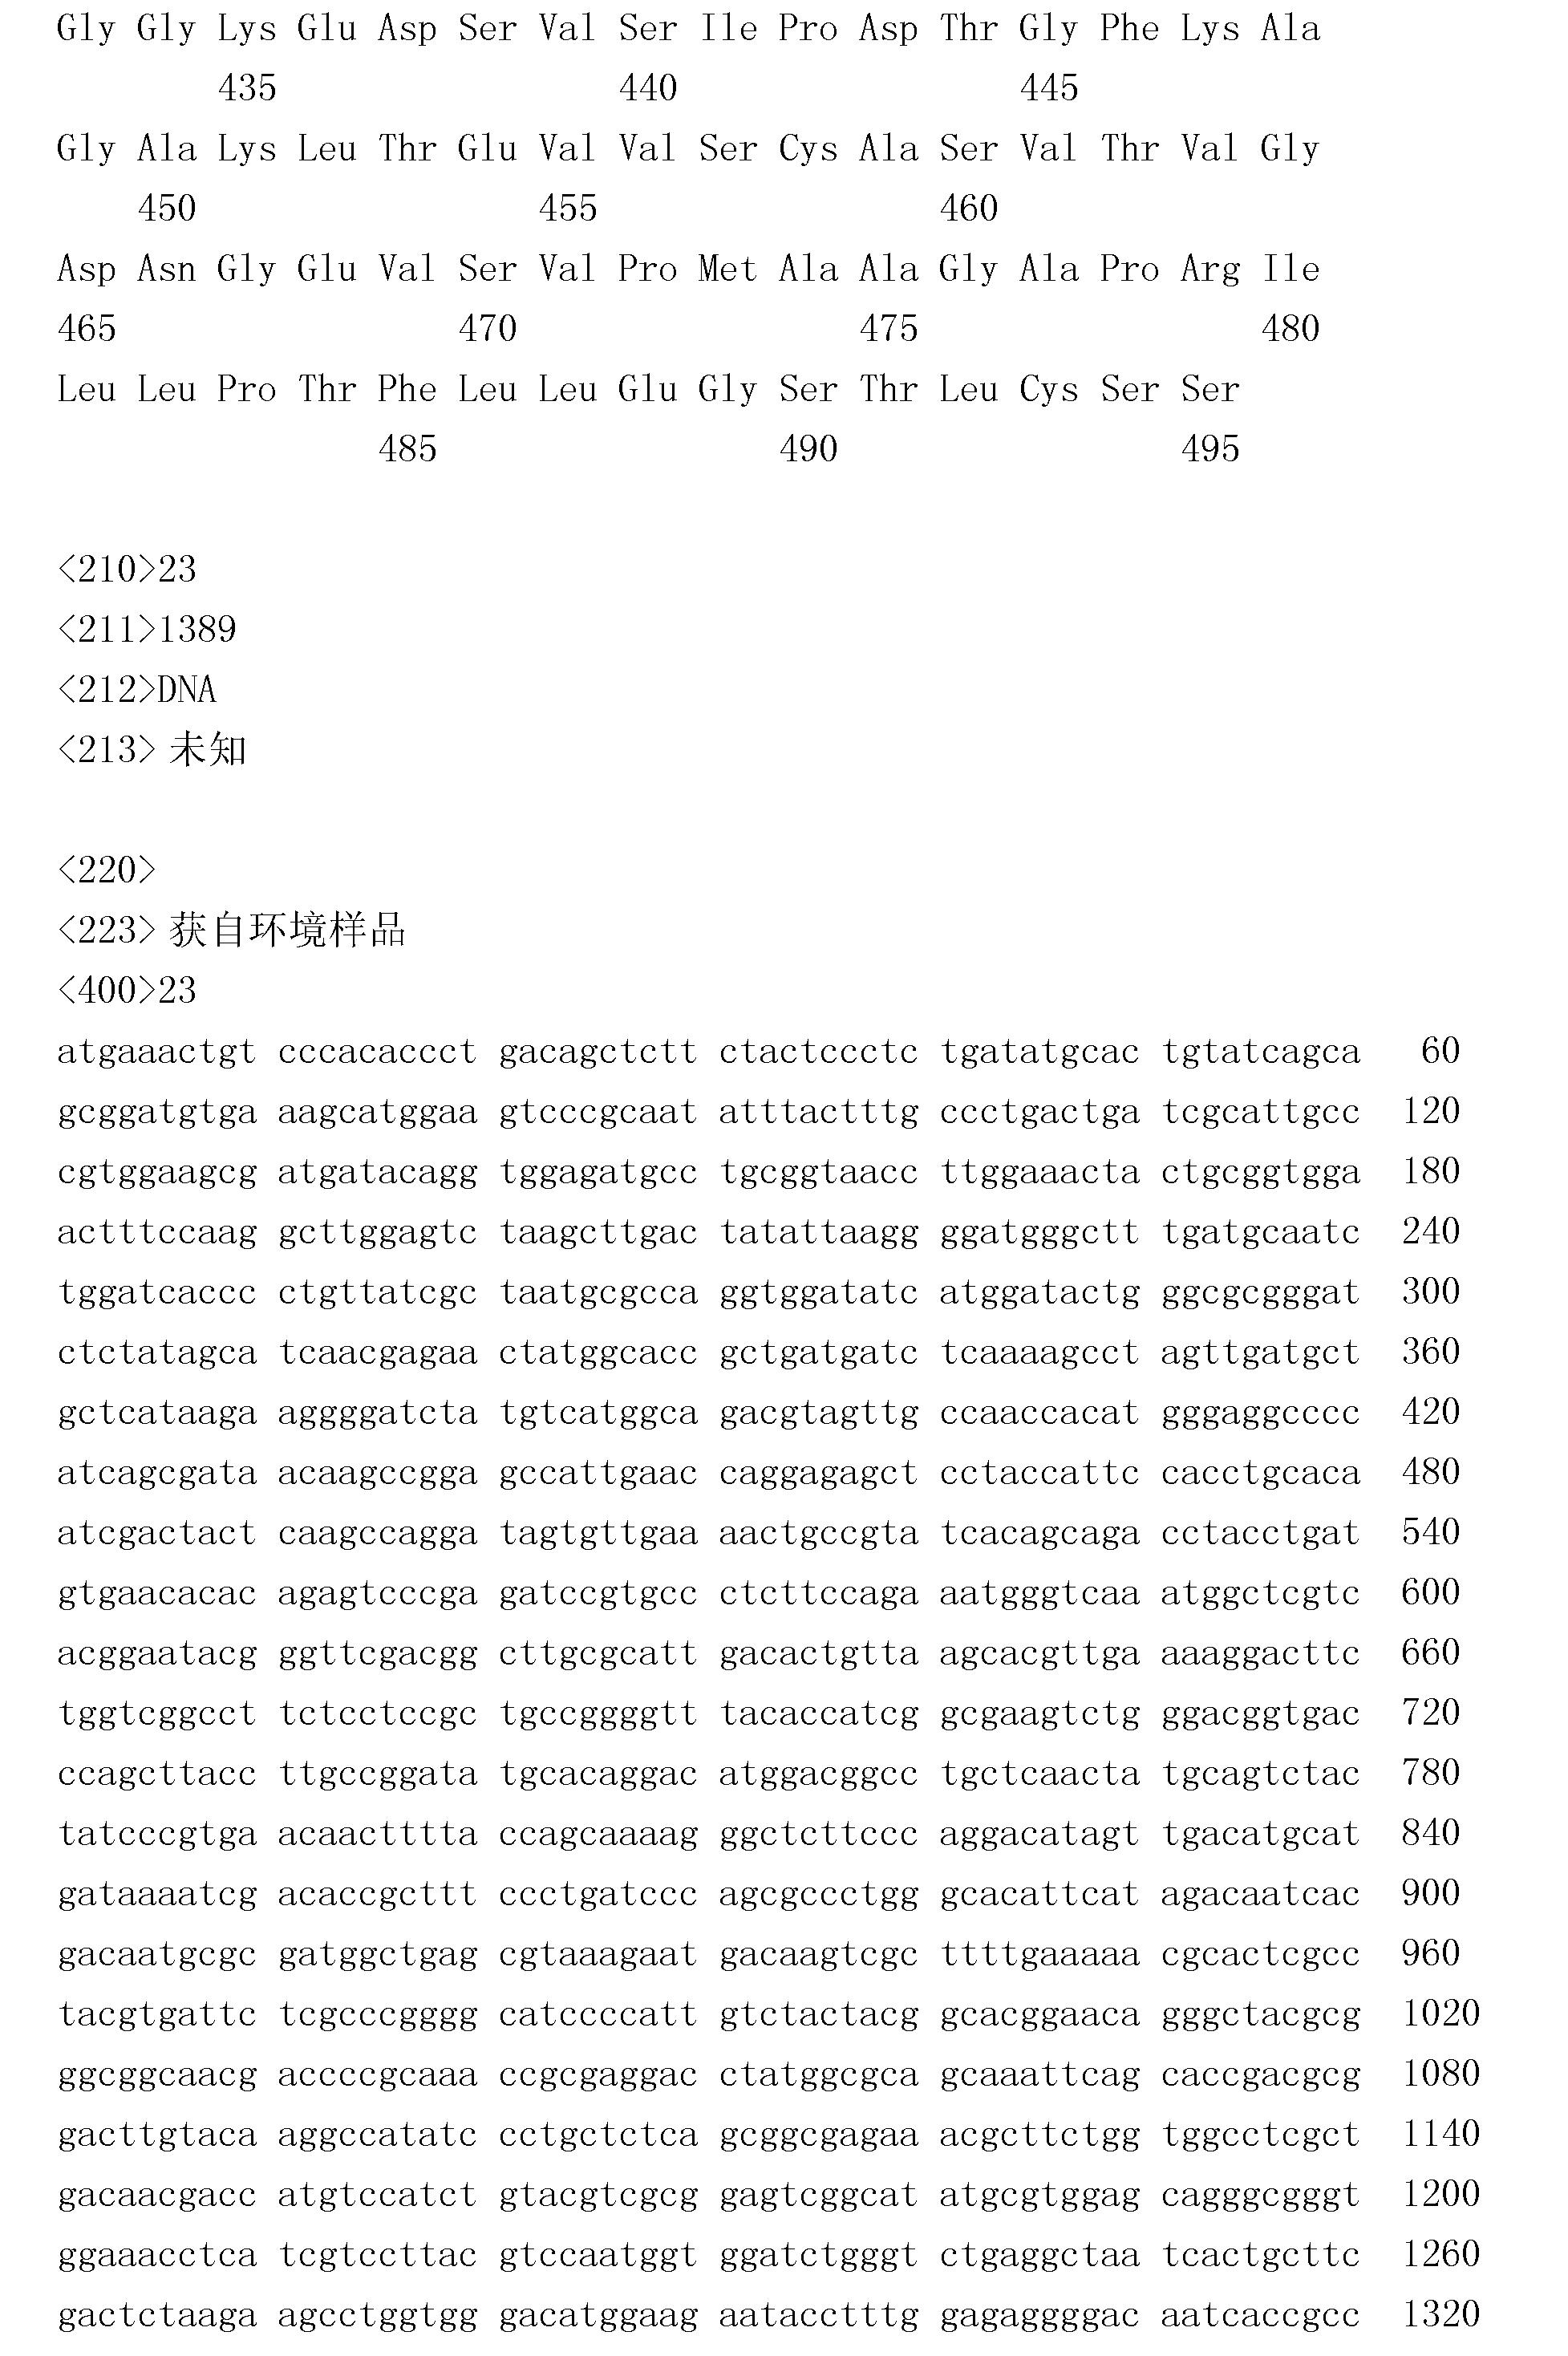 CN101646767B - Amylases and glucoamylases, nucleic acids encoding ...